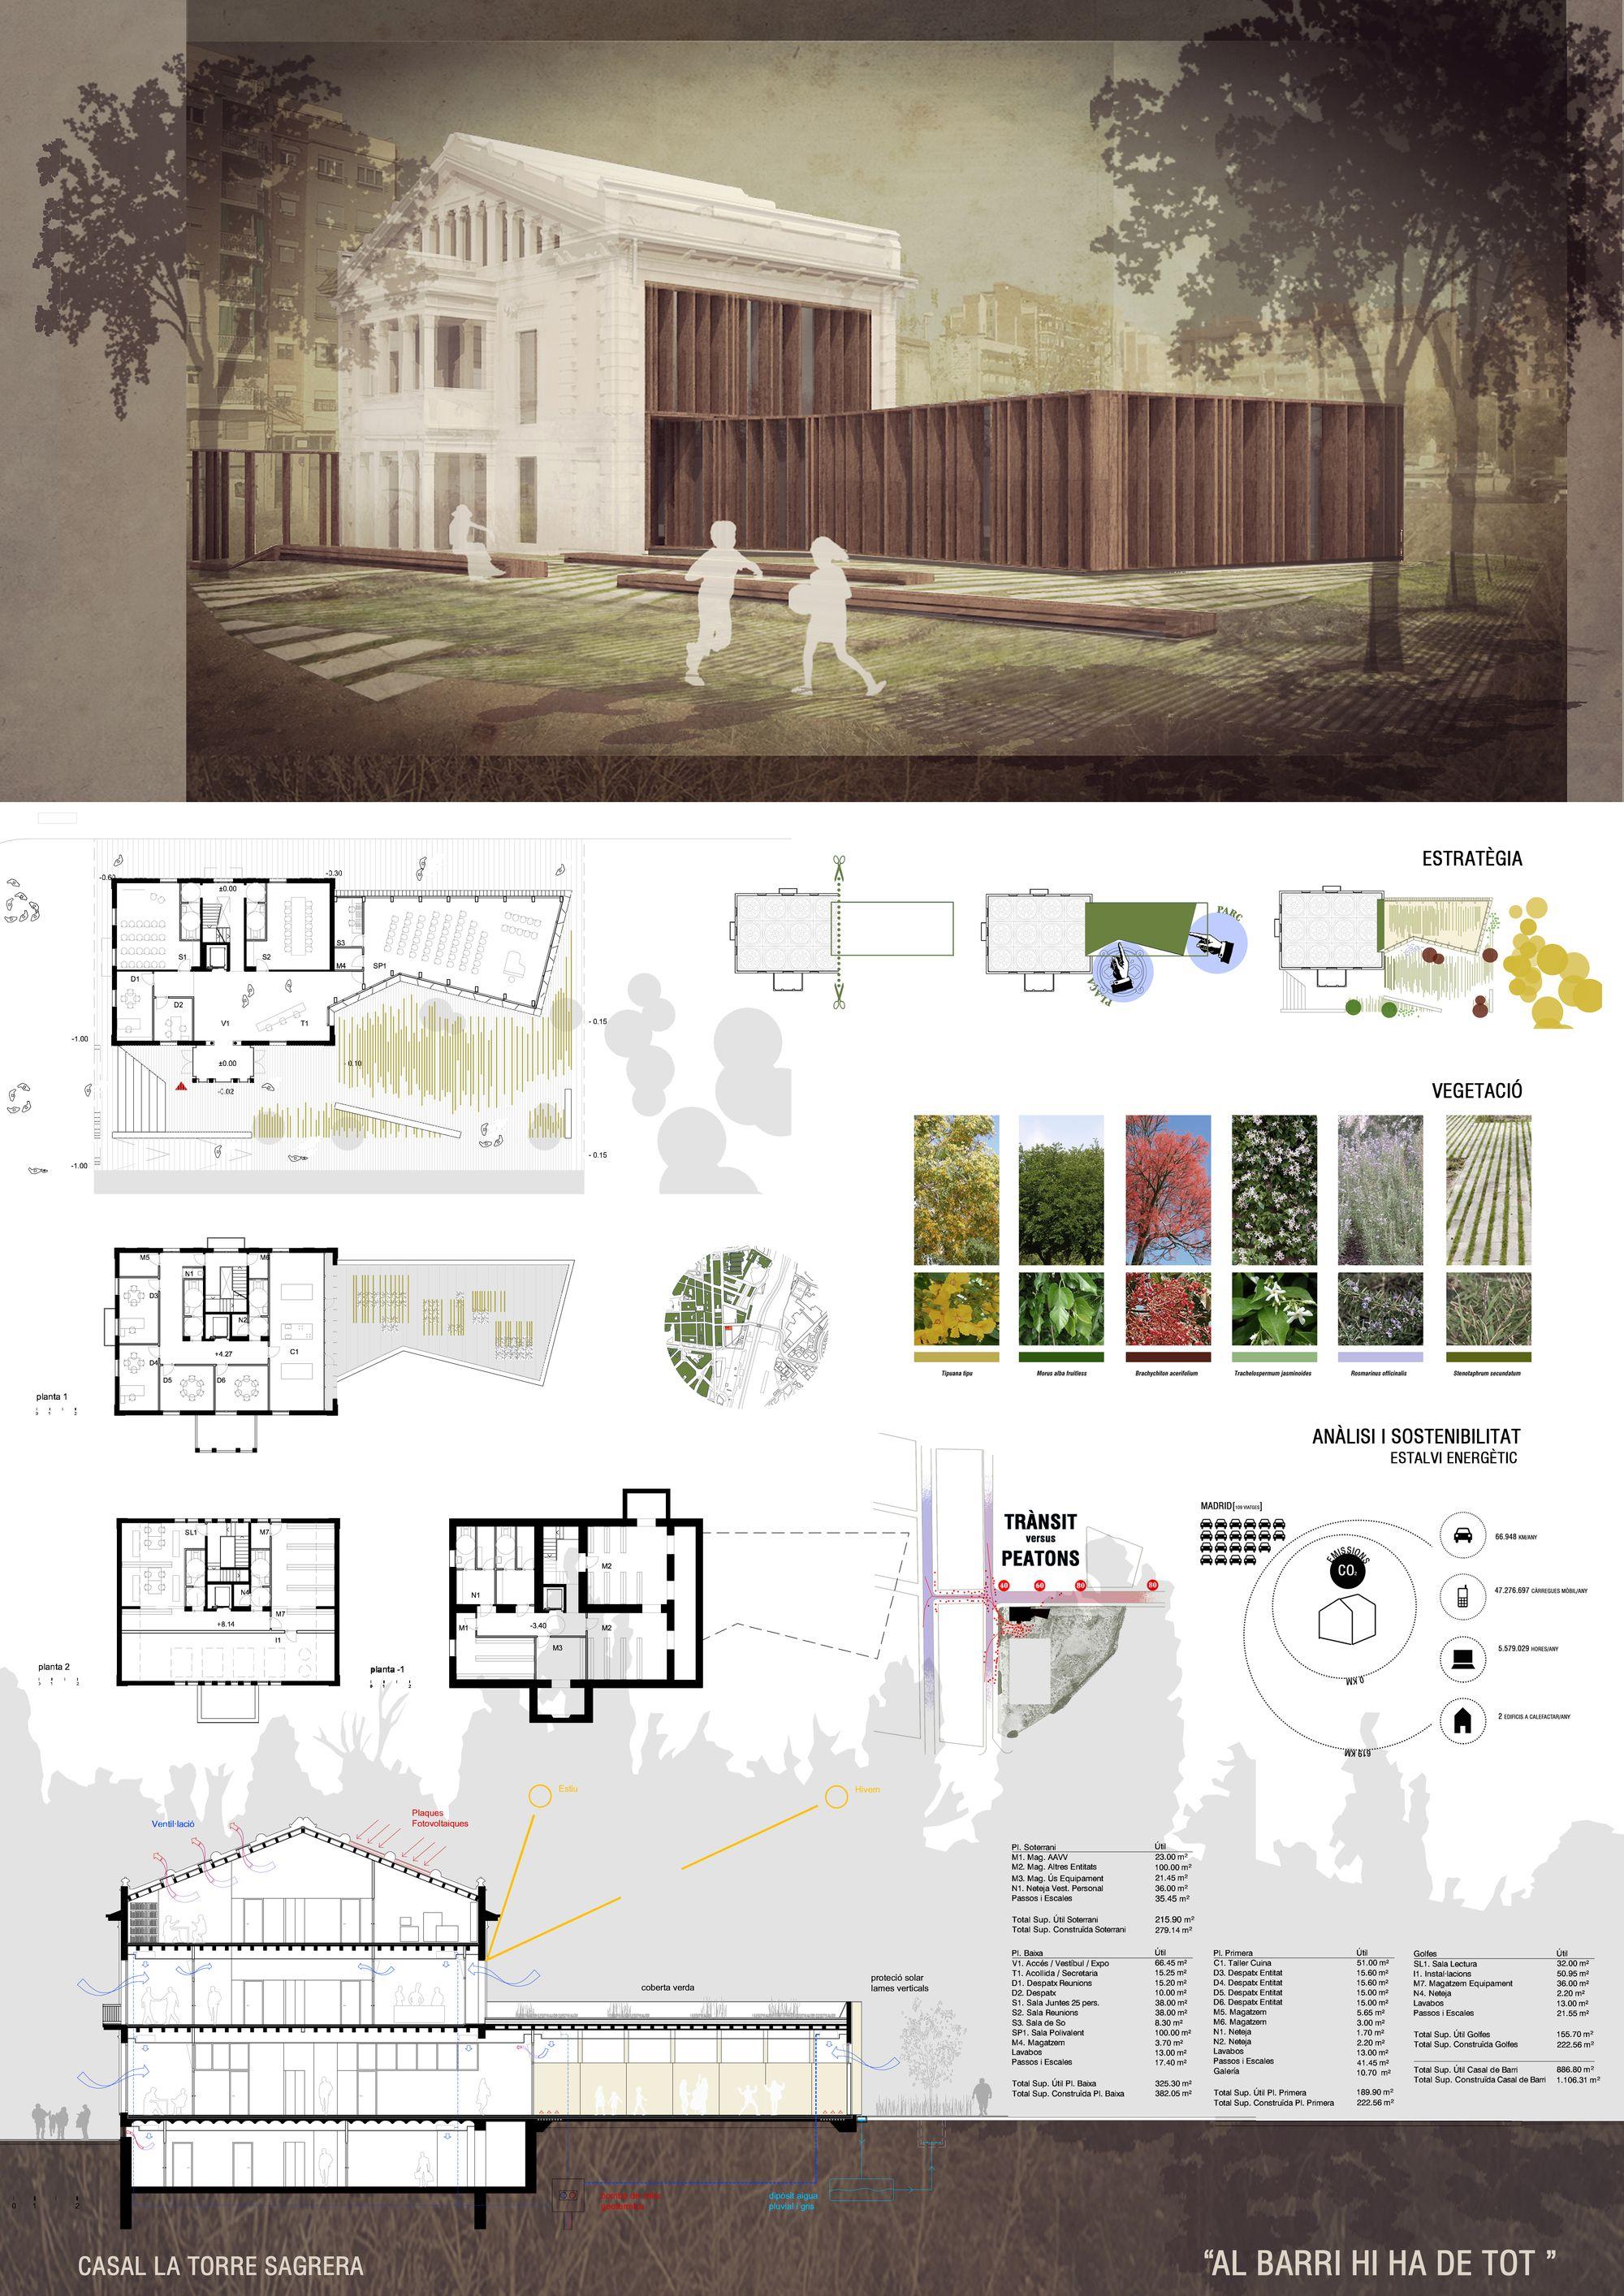 Presentacion Proyecto Paisajismo Arquitectura Paisajista Arquitectos Paisajismo